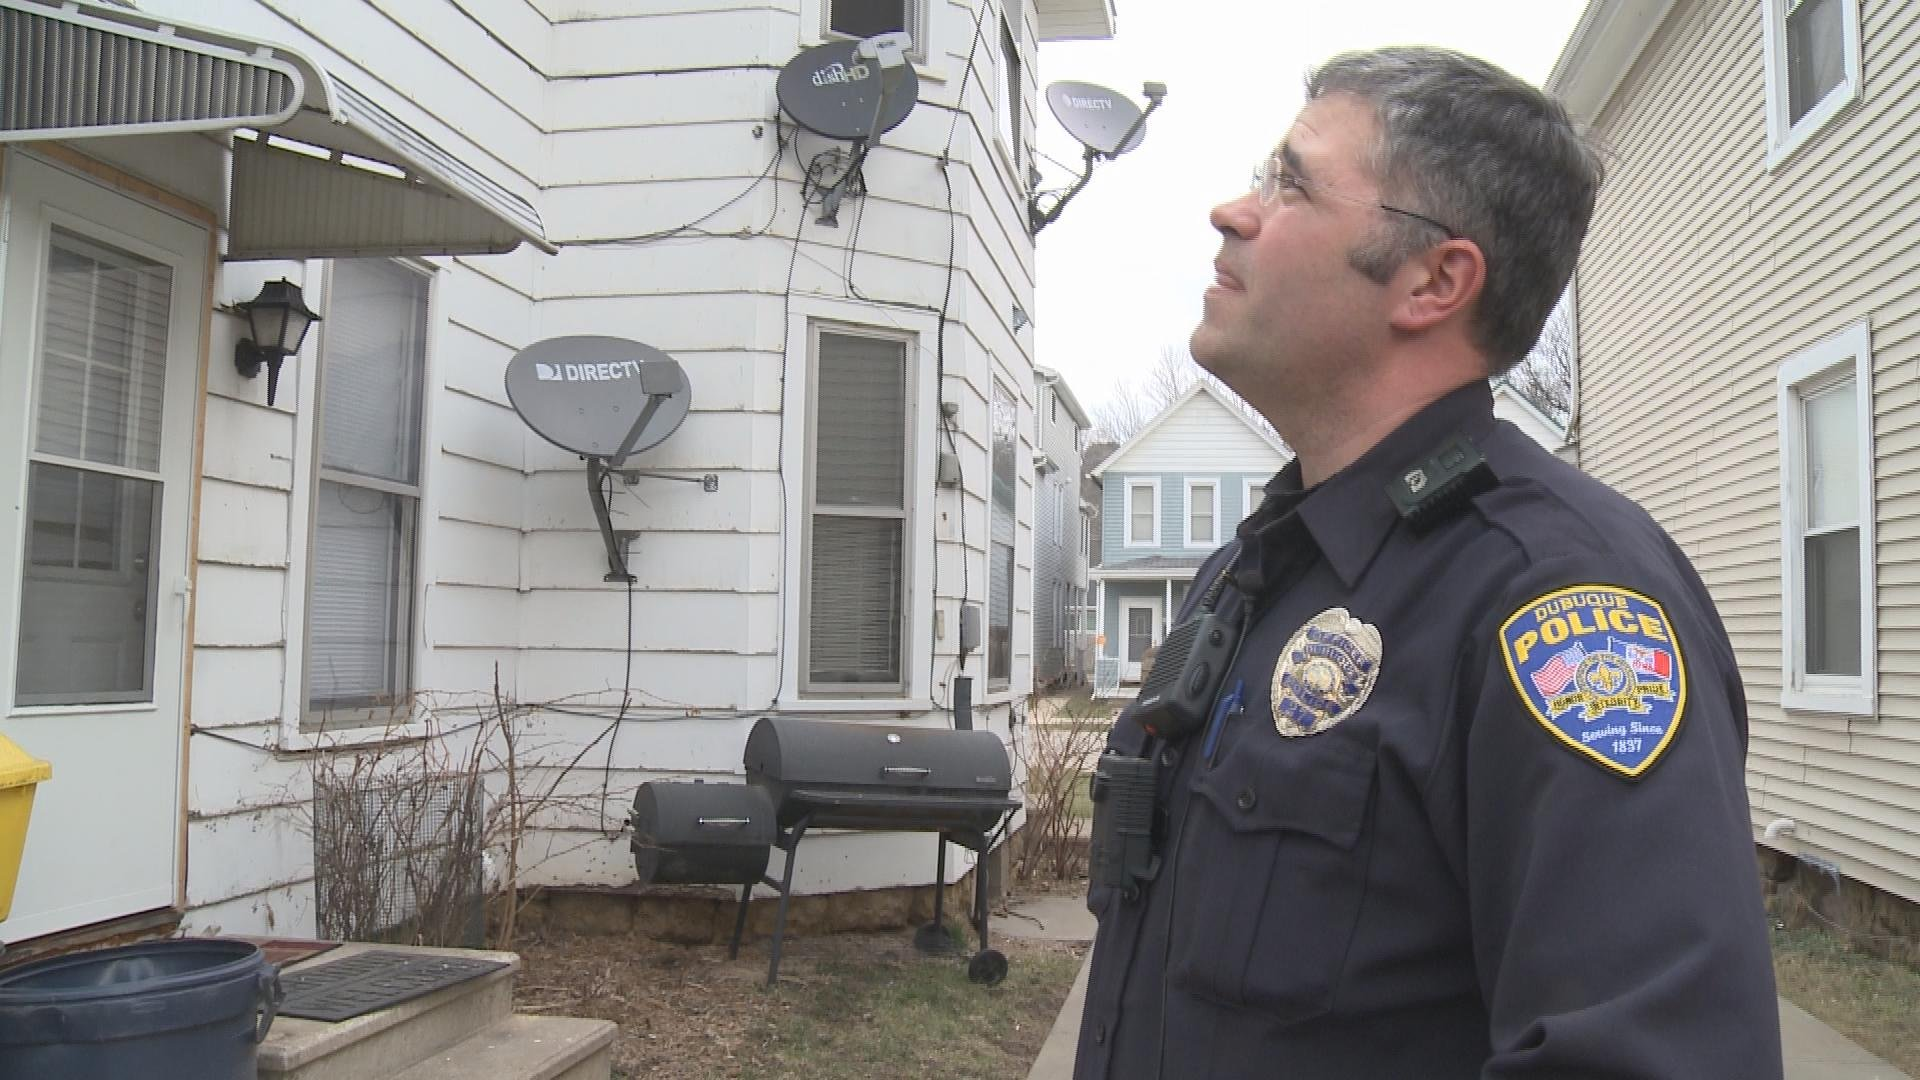 Officer Dane Cox